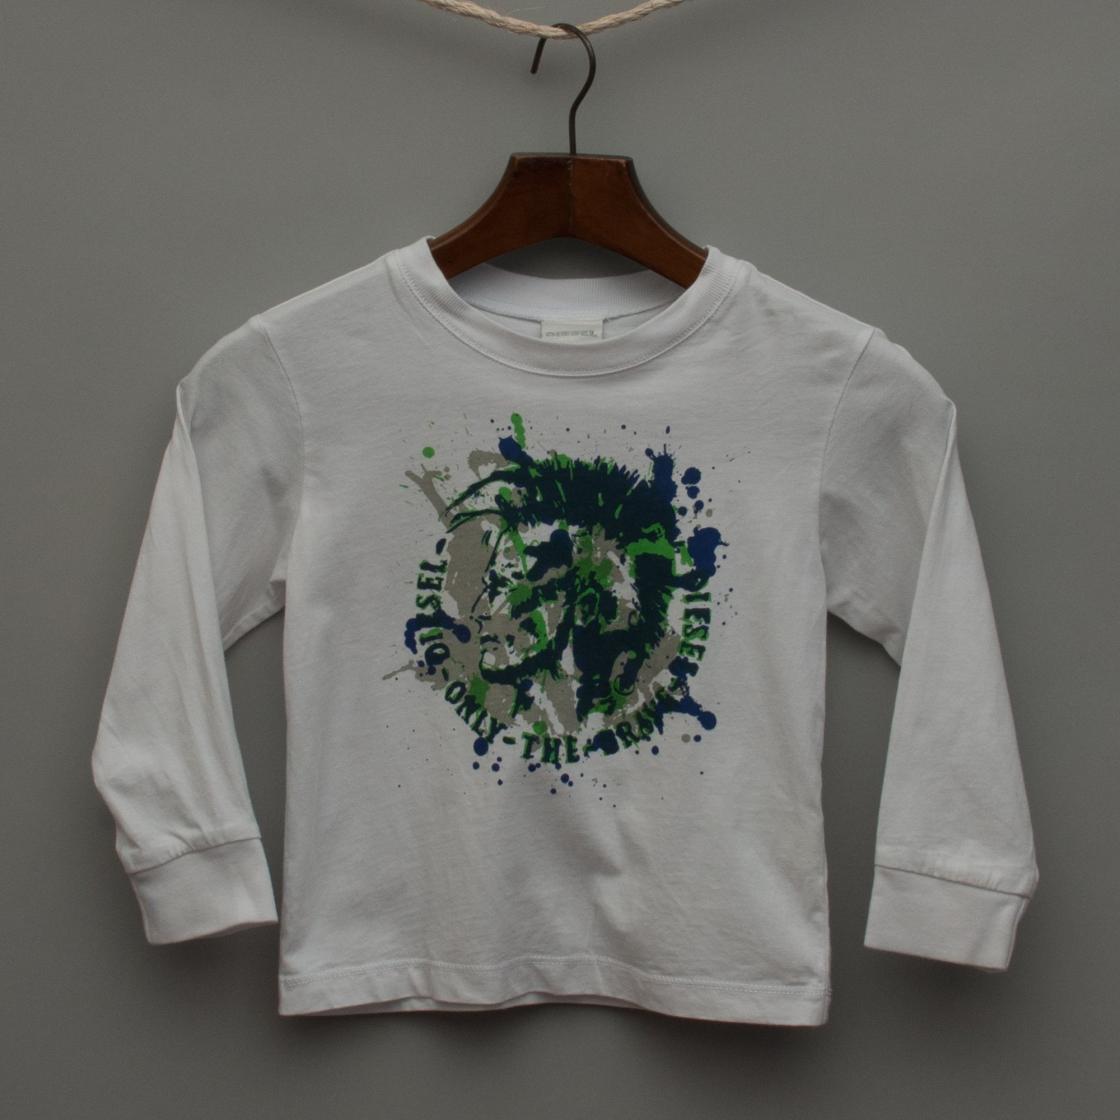 White Printed Long Sleeve Top